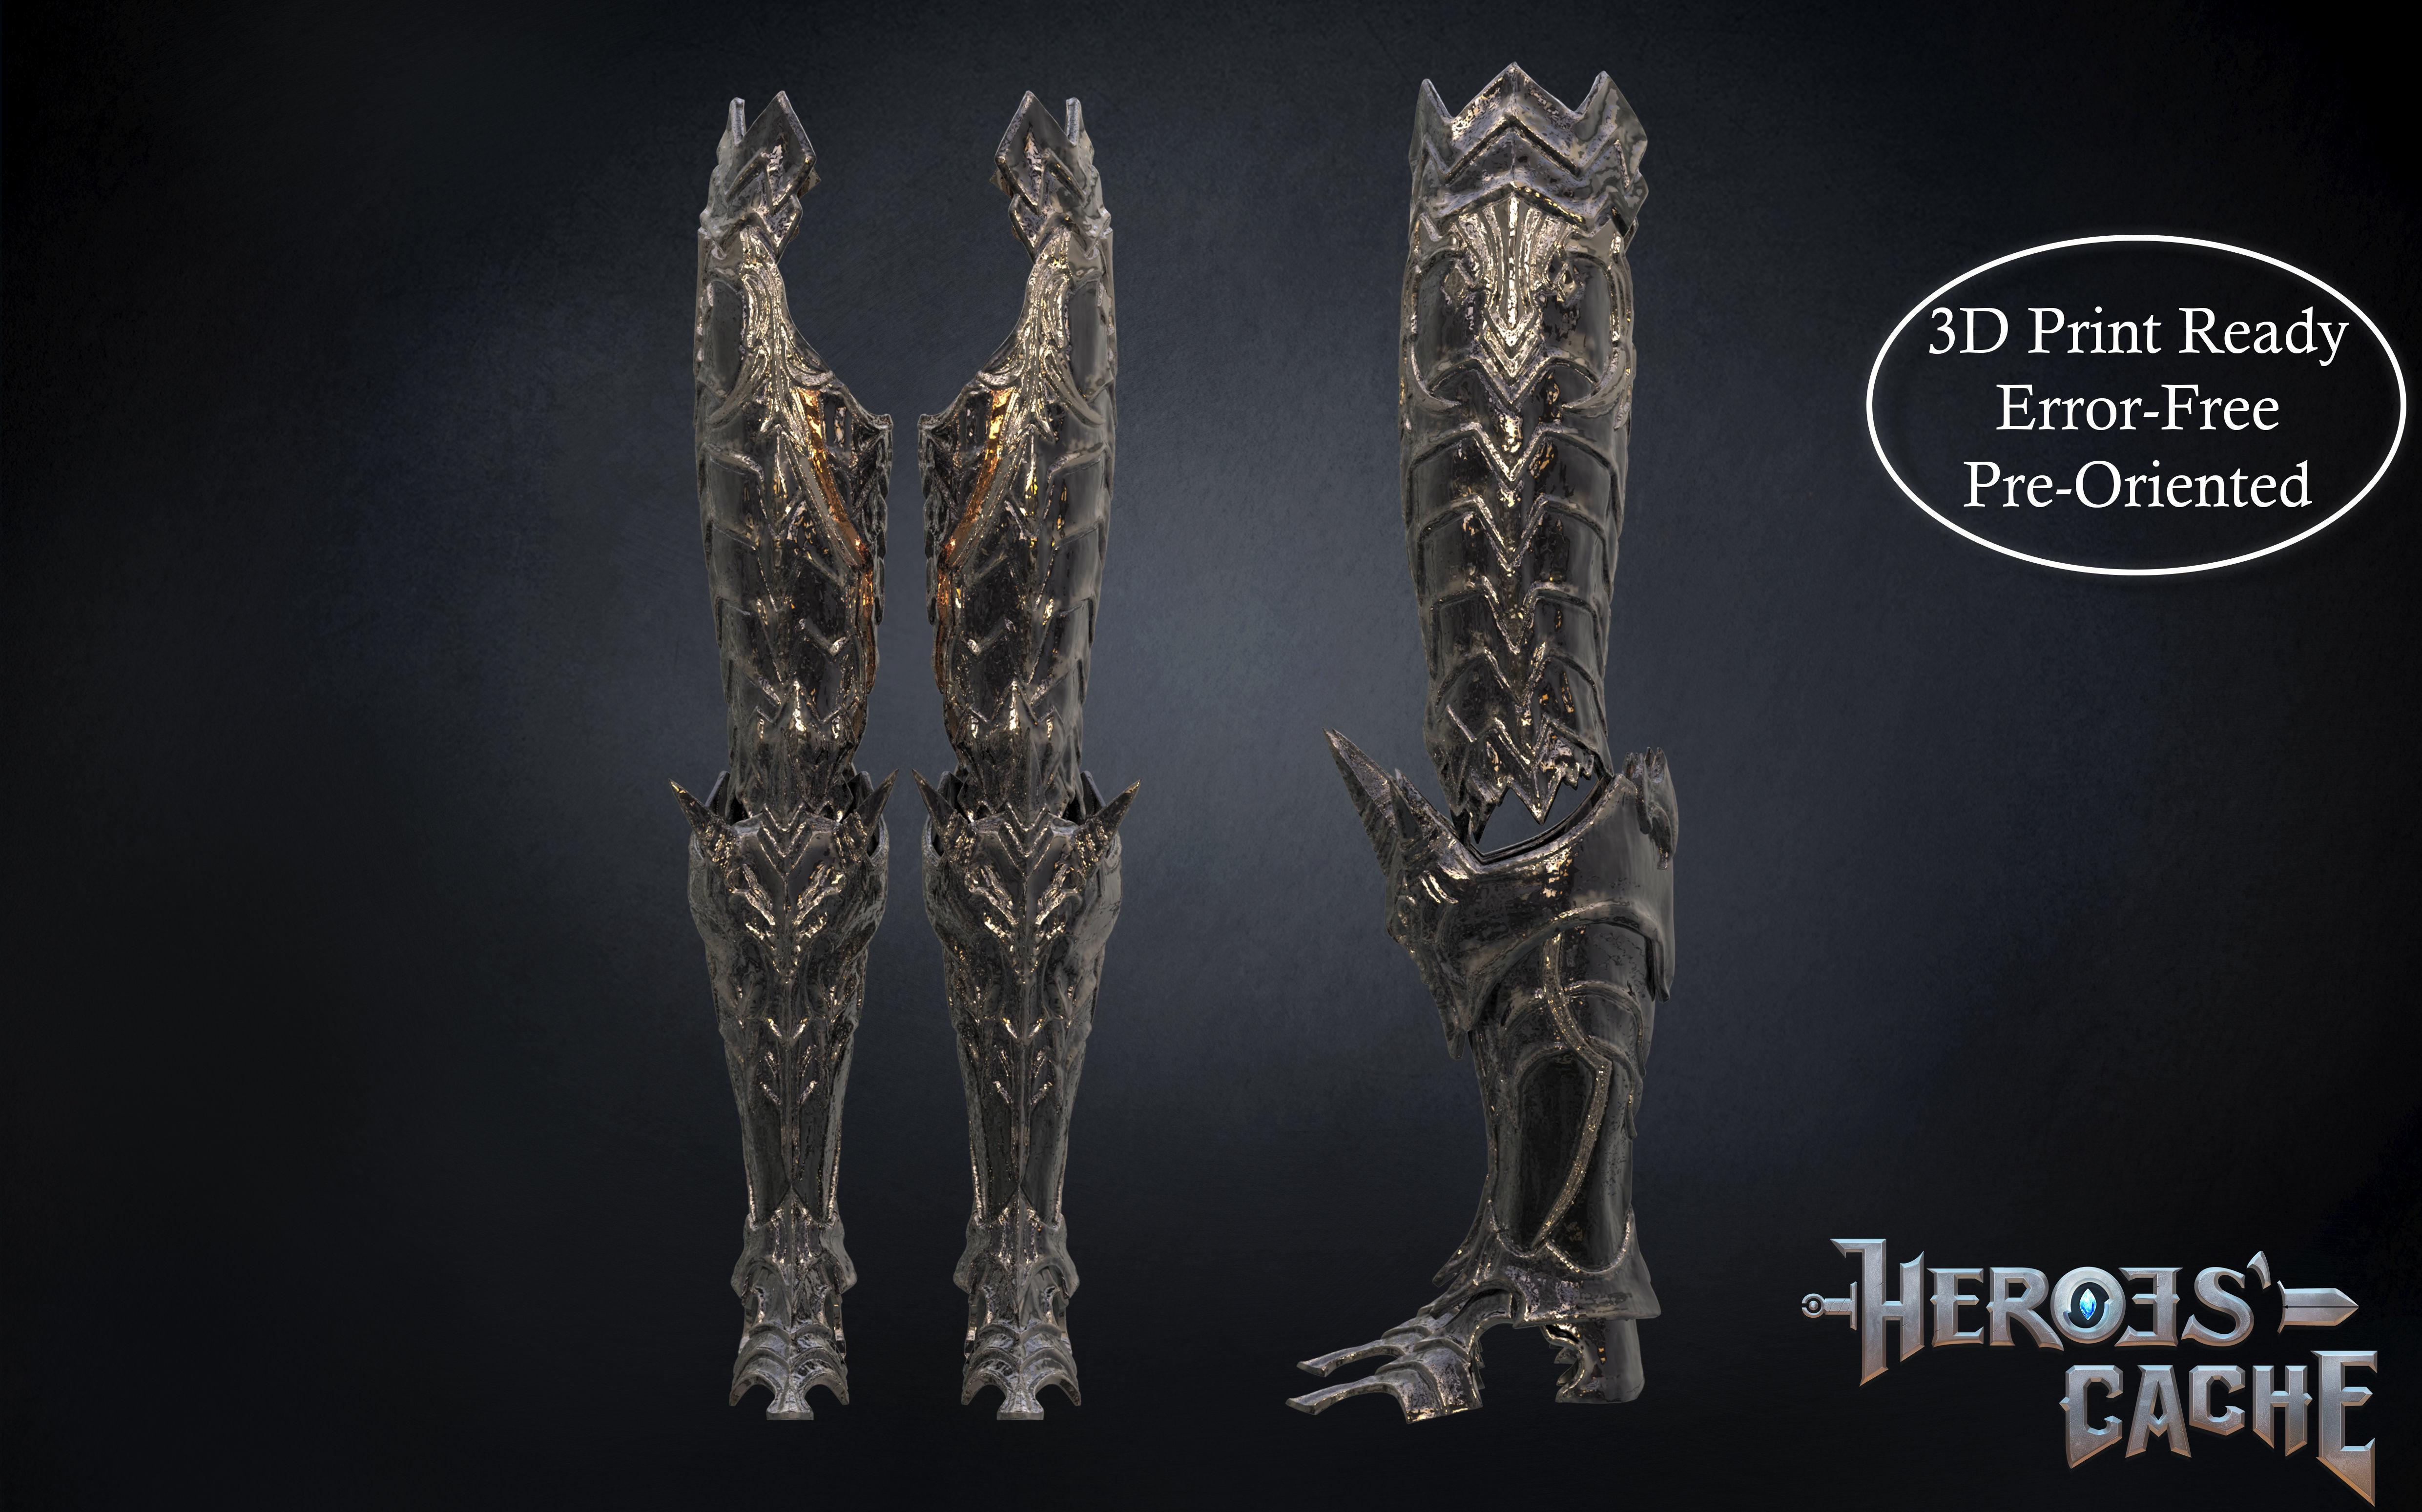 Final Fantasy XIV - Dark Knight Chaos Armor - Leg parts